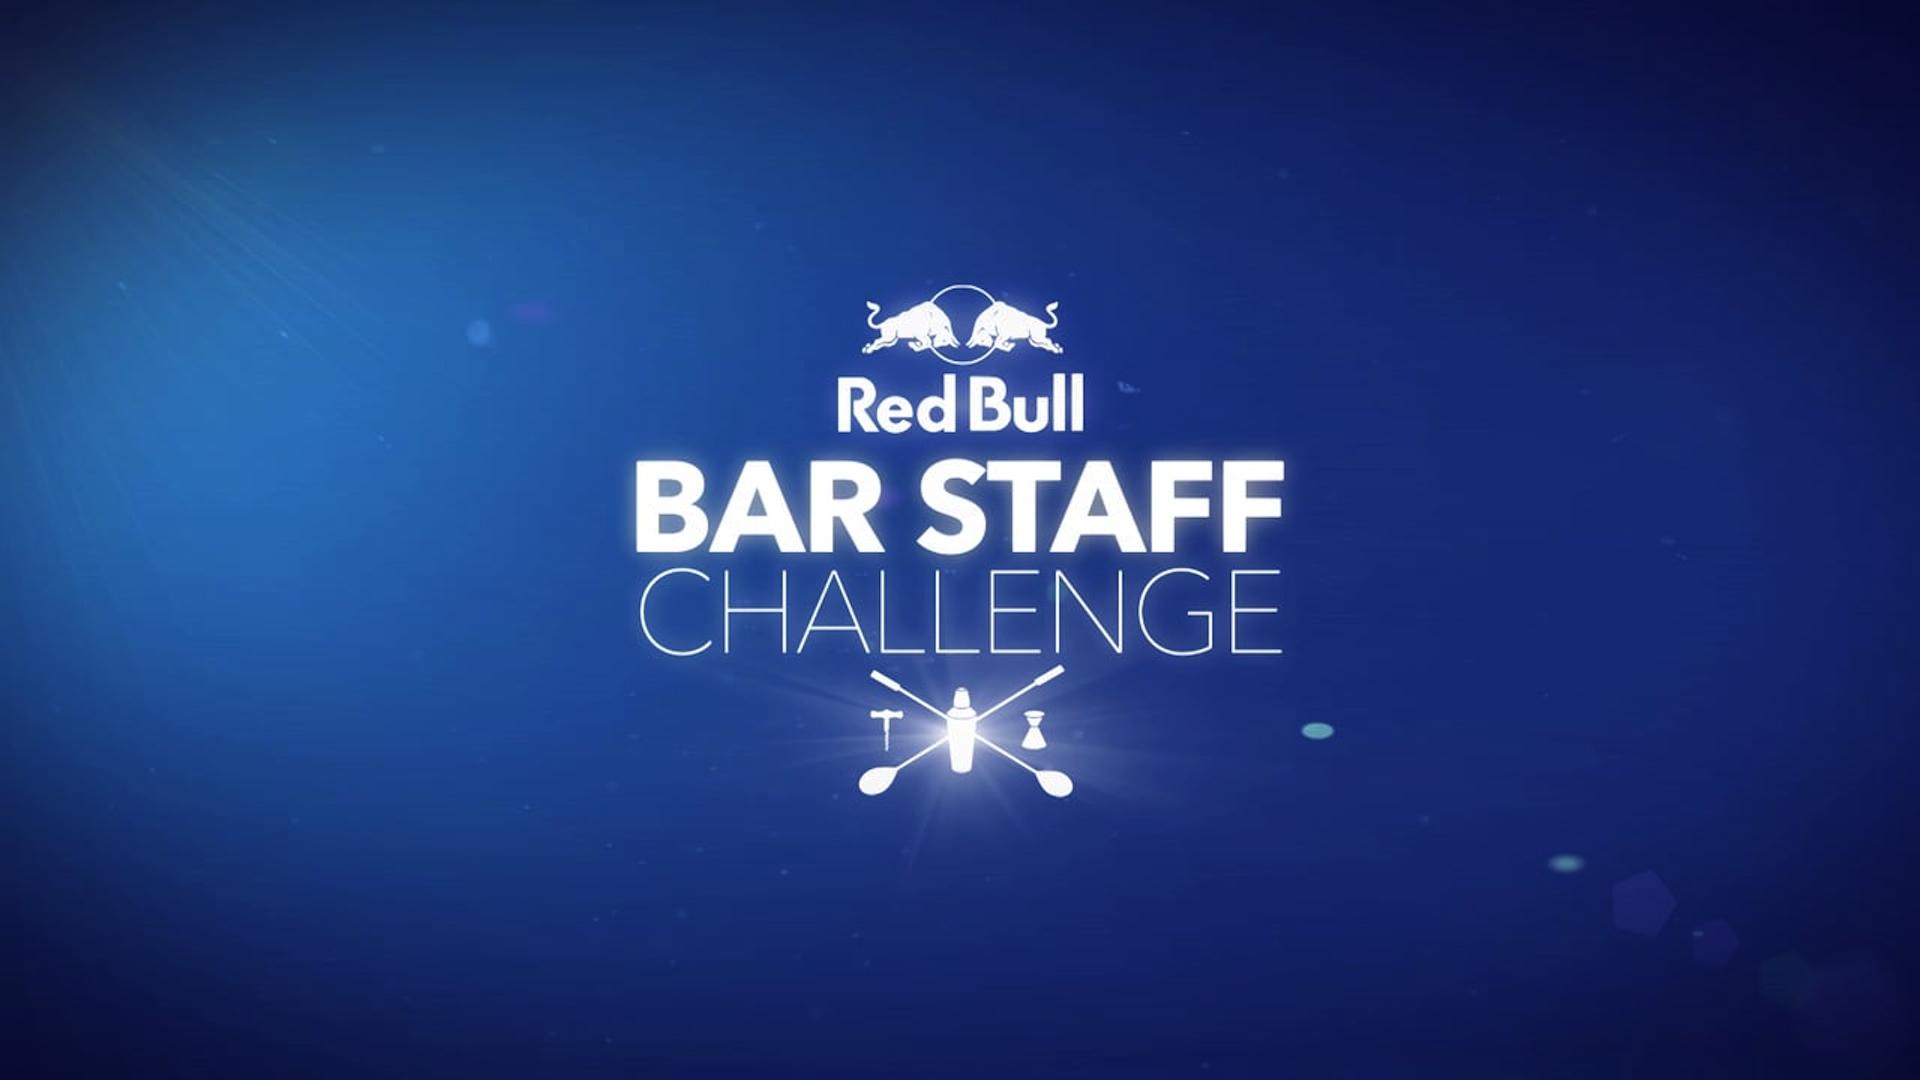 Redbull Bar